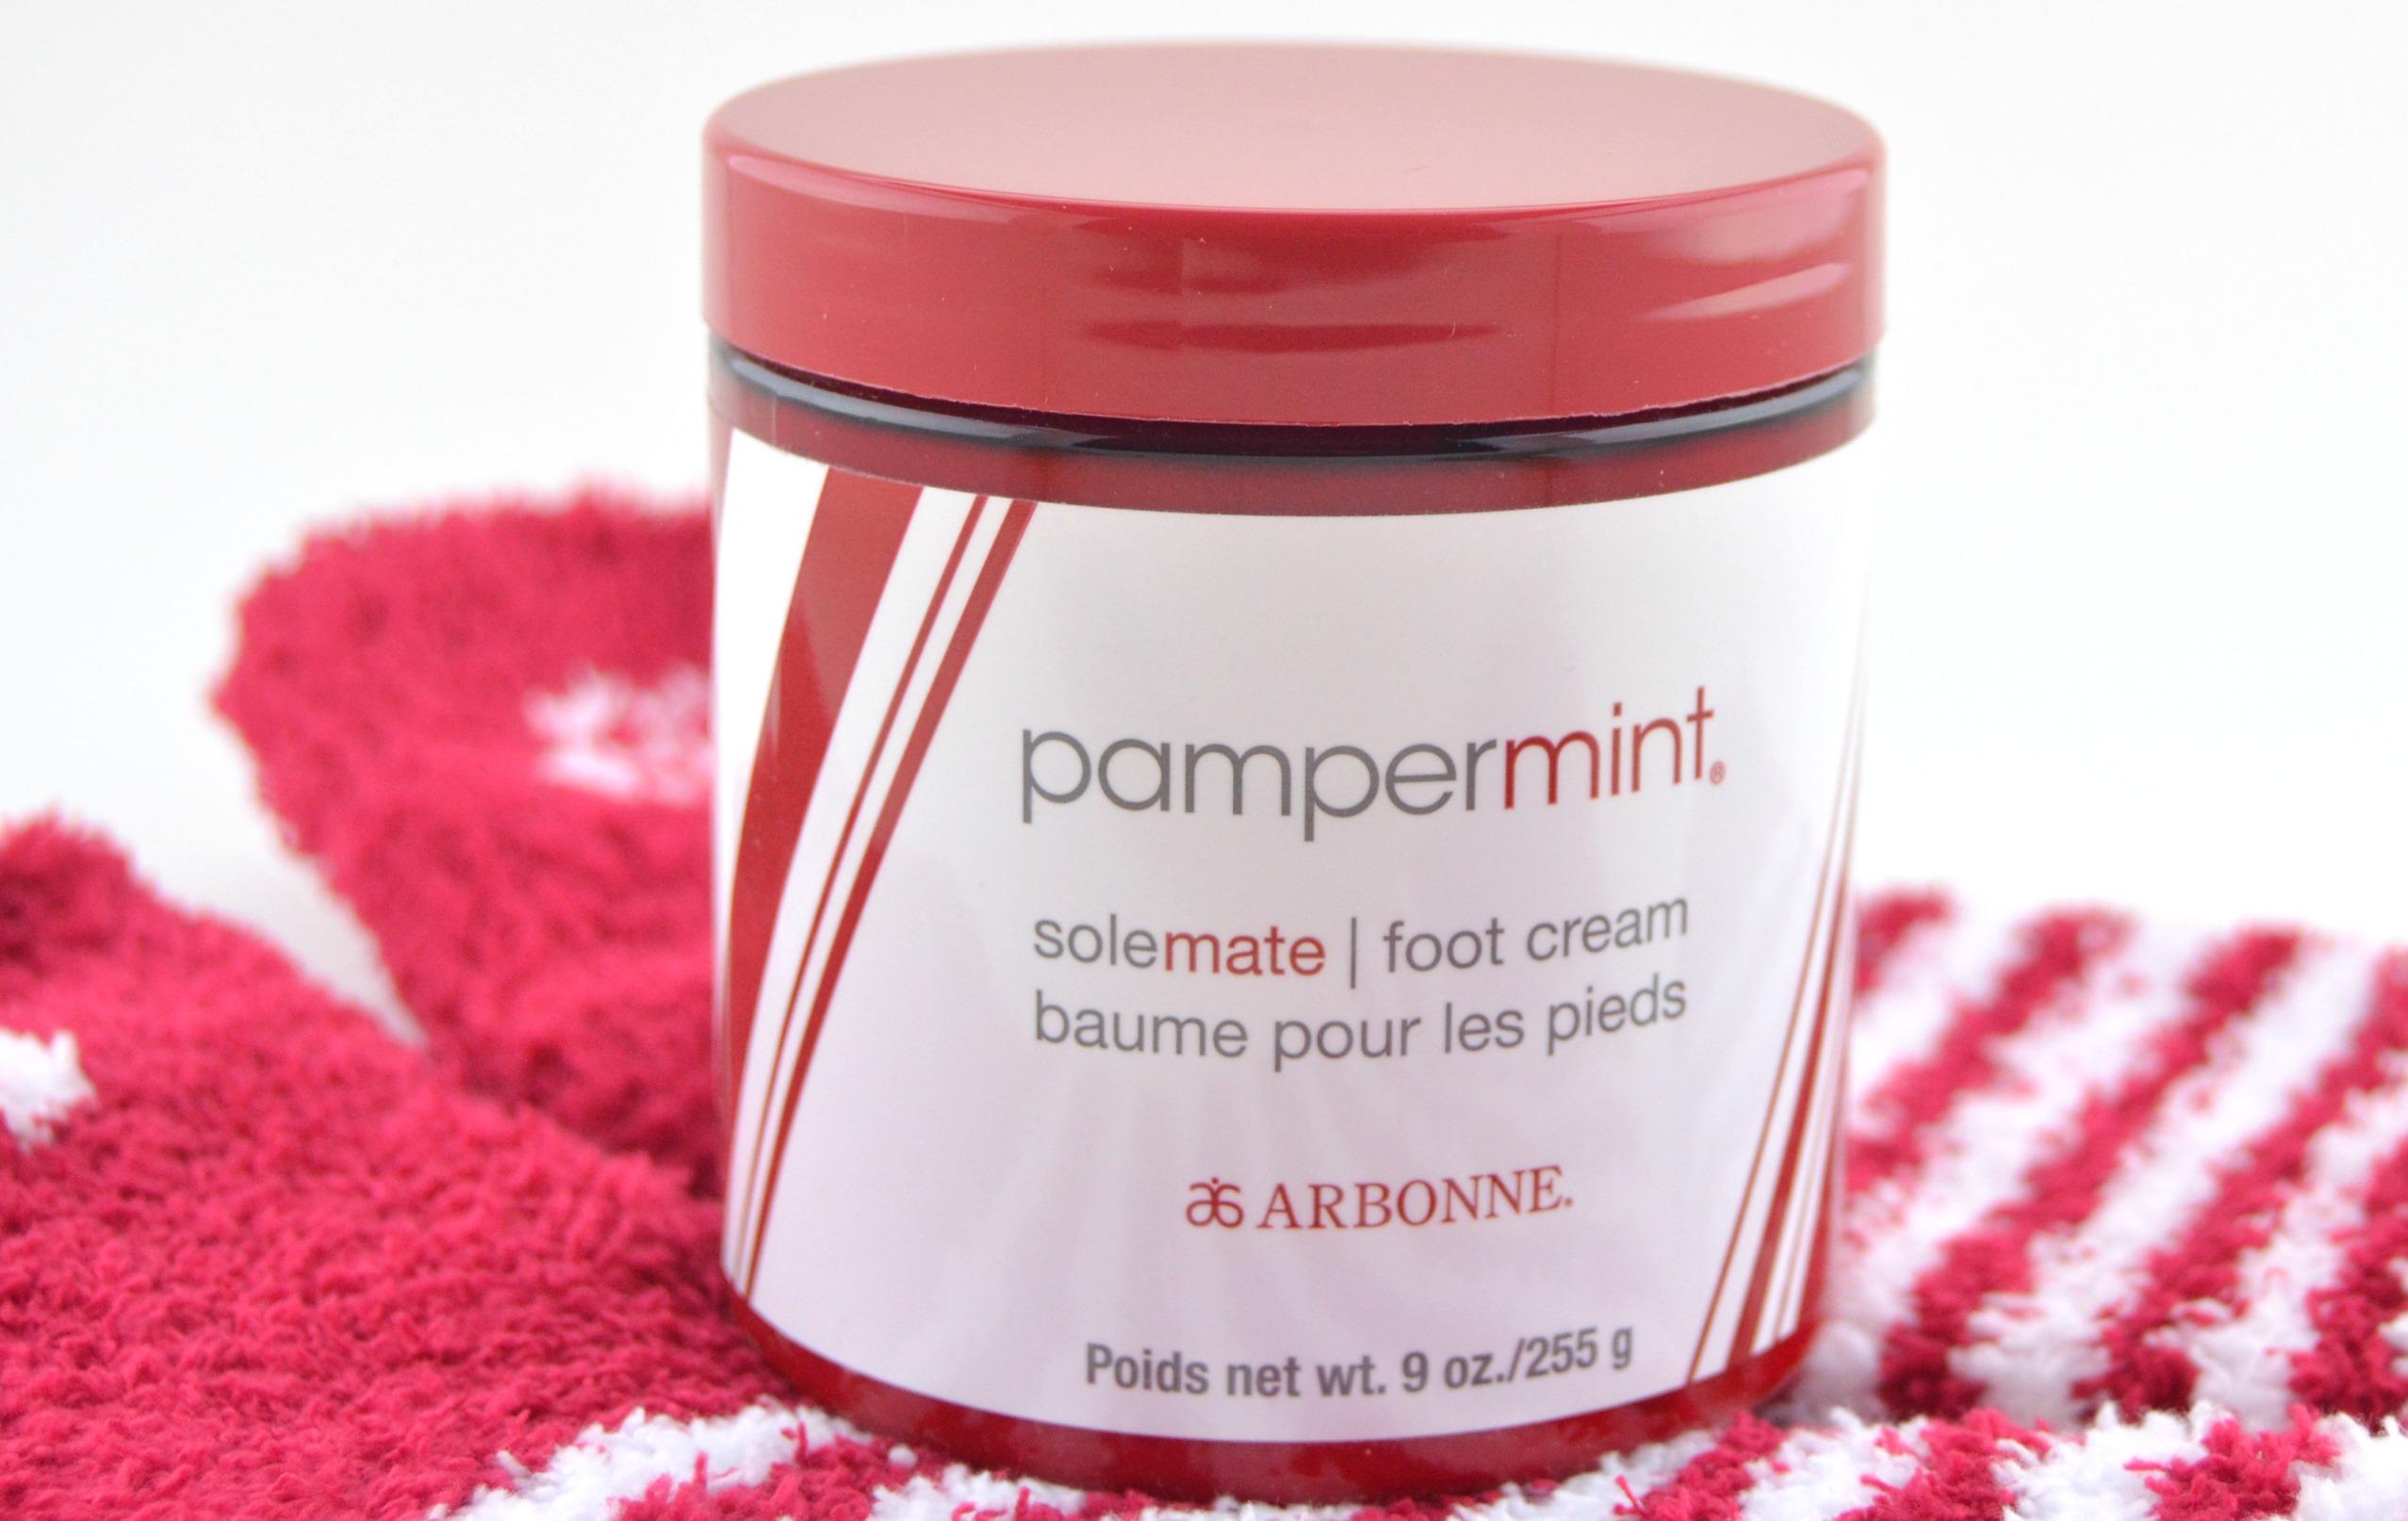 Arbonne Pampermint Foot Care Gift Set